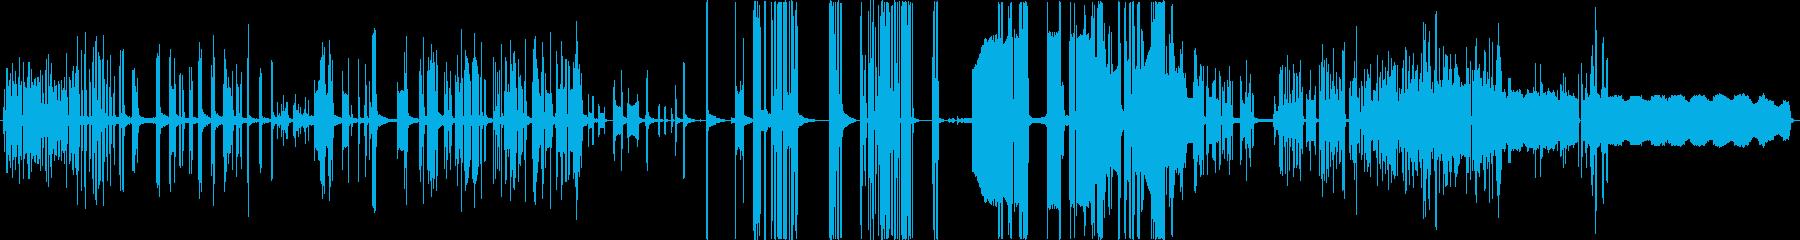 GUITAR AMPLIFIER:...の再生済みの波形